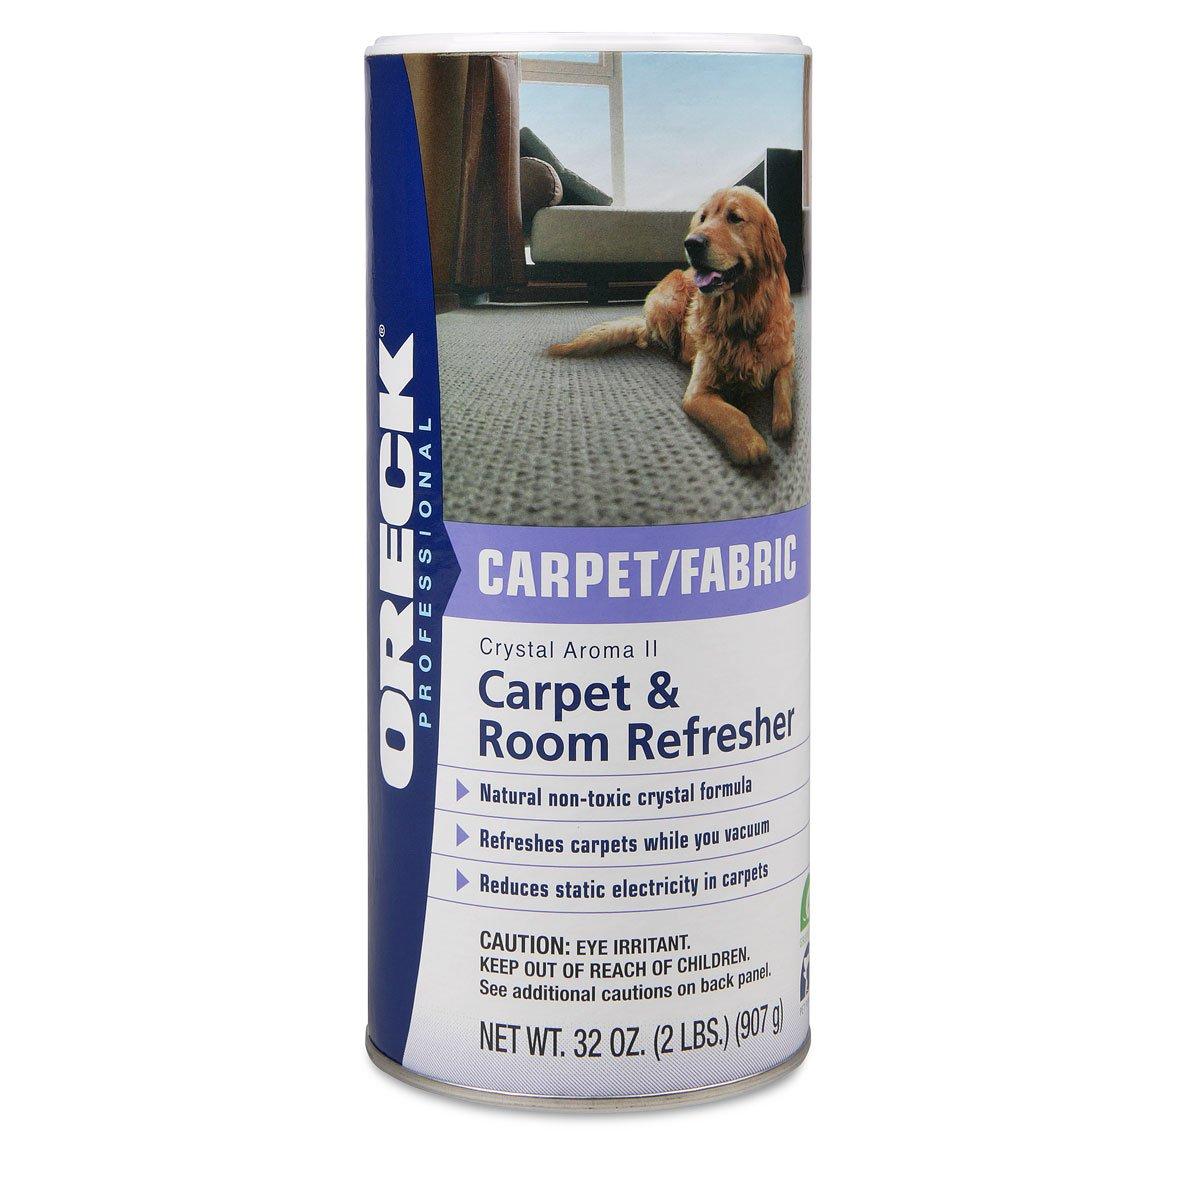 Oreck Crystal Aroma II Carpet & Room Freshener 32 oz.